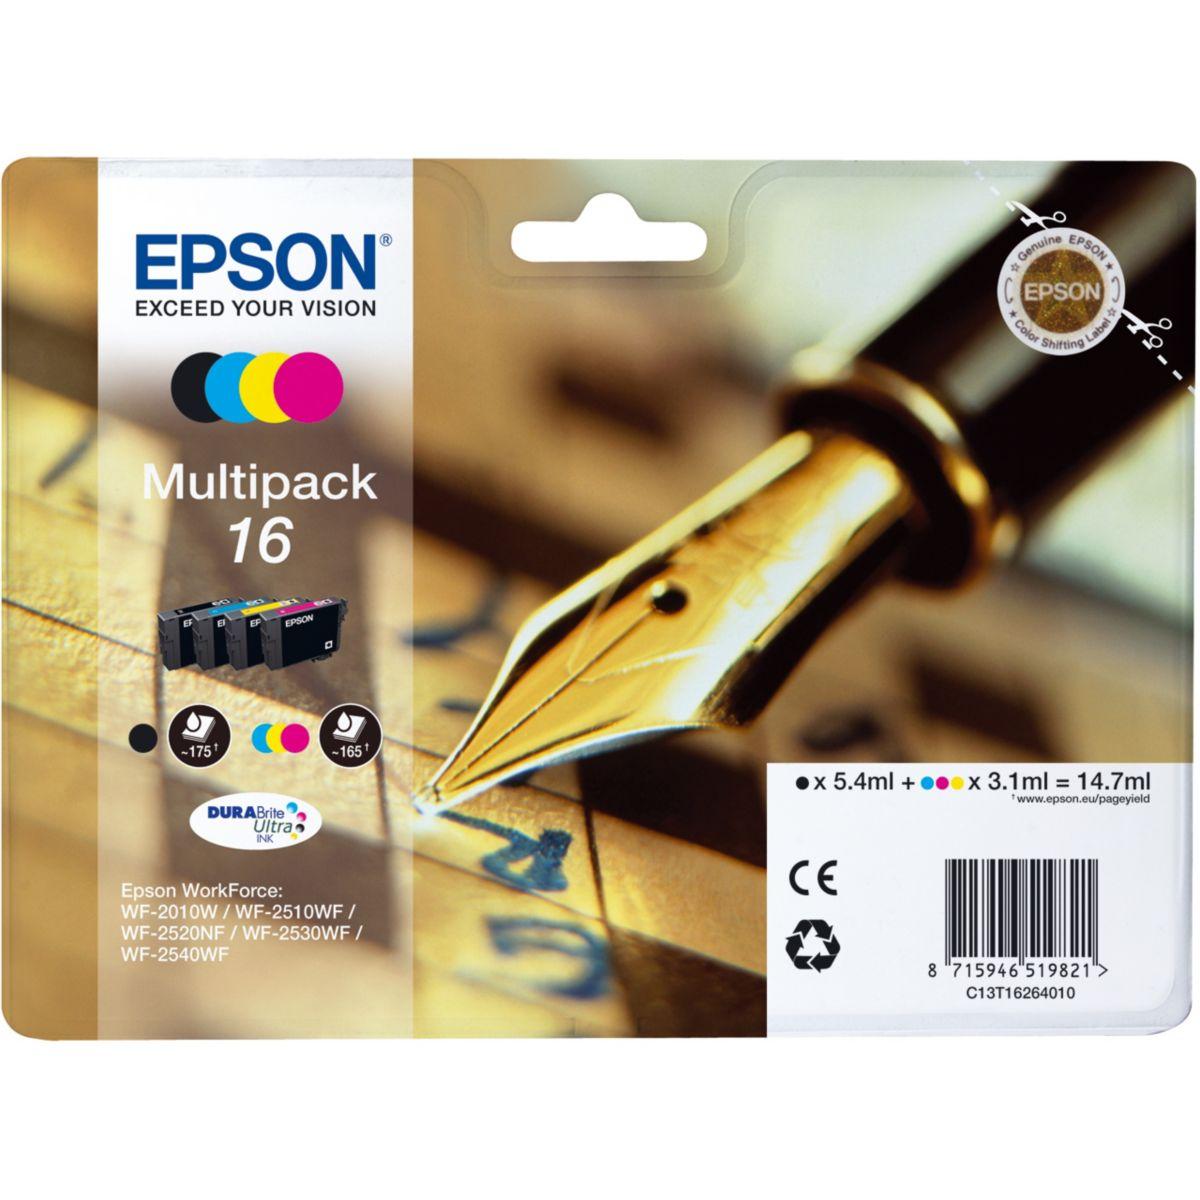 Multipack cartouches d'encre epson (noir/cyan/magenta/jaune) t1626 s?rie stylo plume